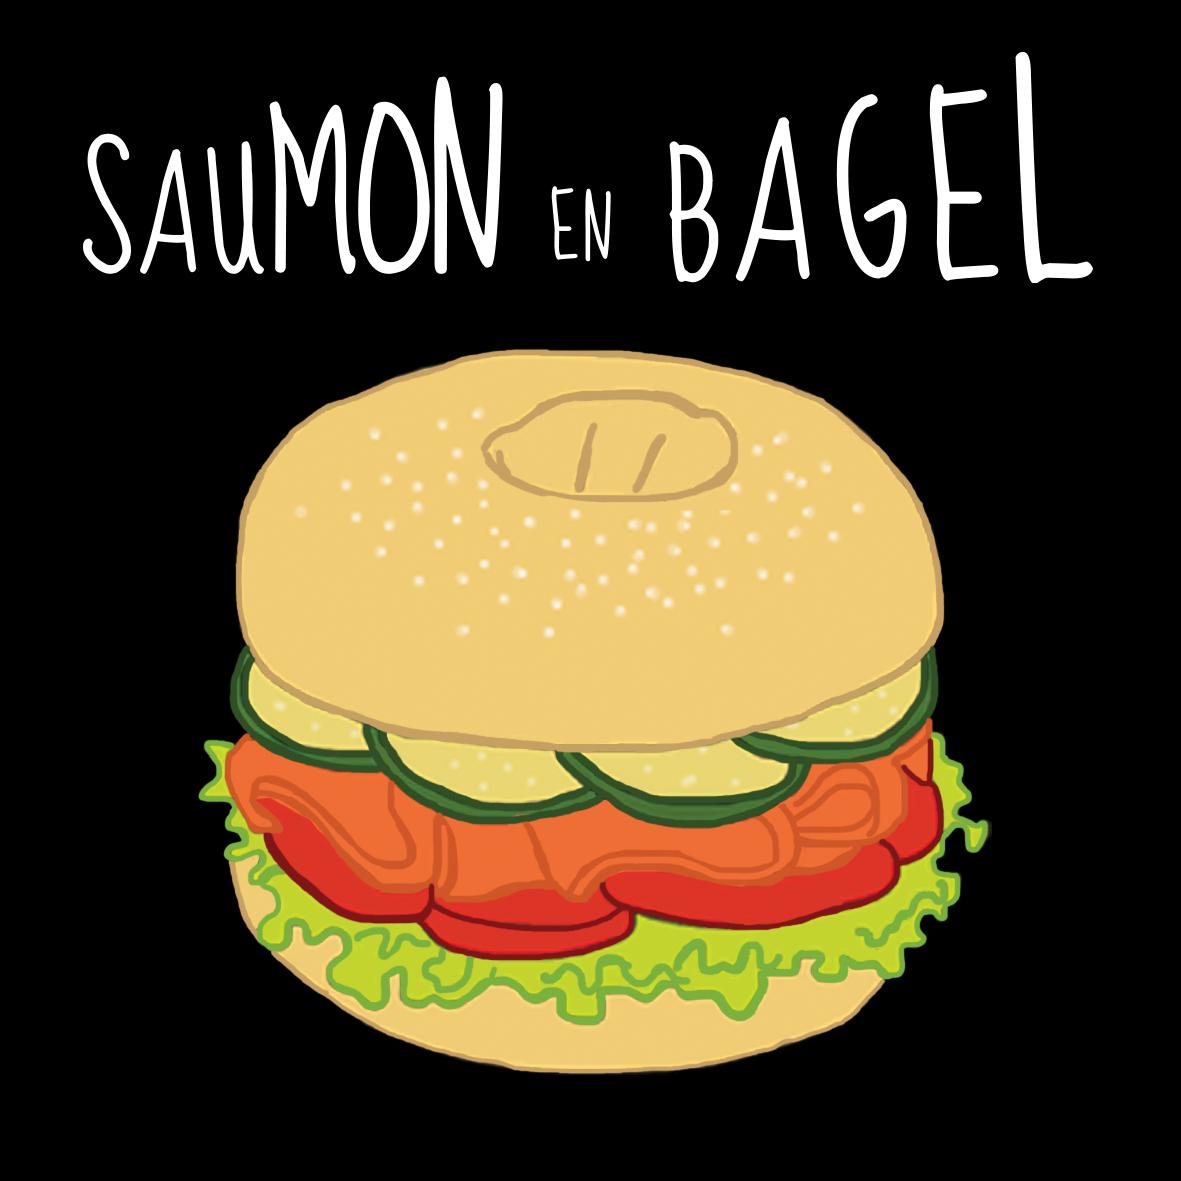 Saumon en bagel